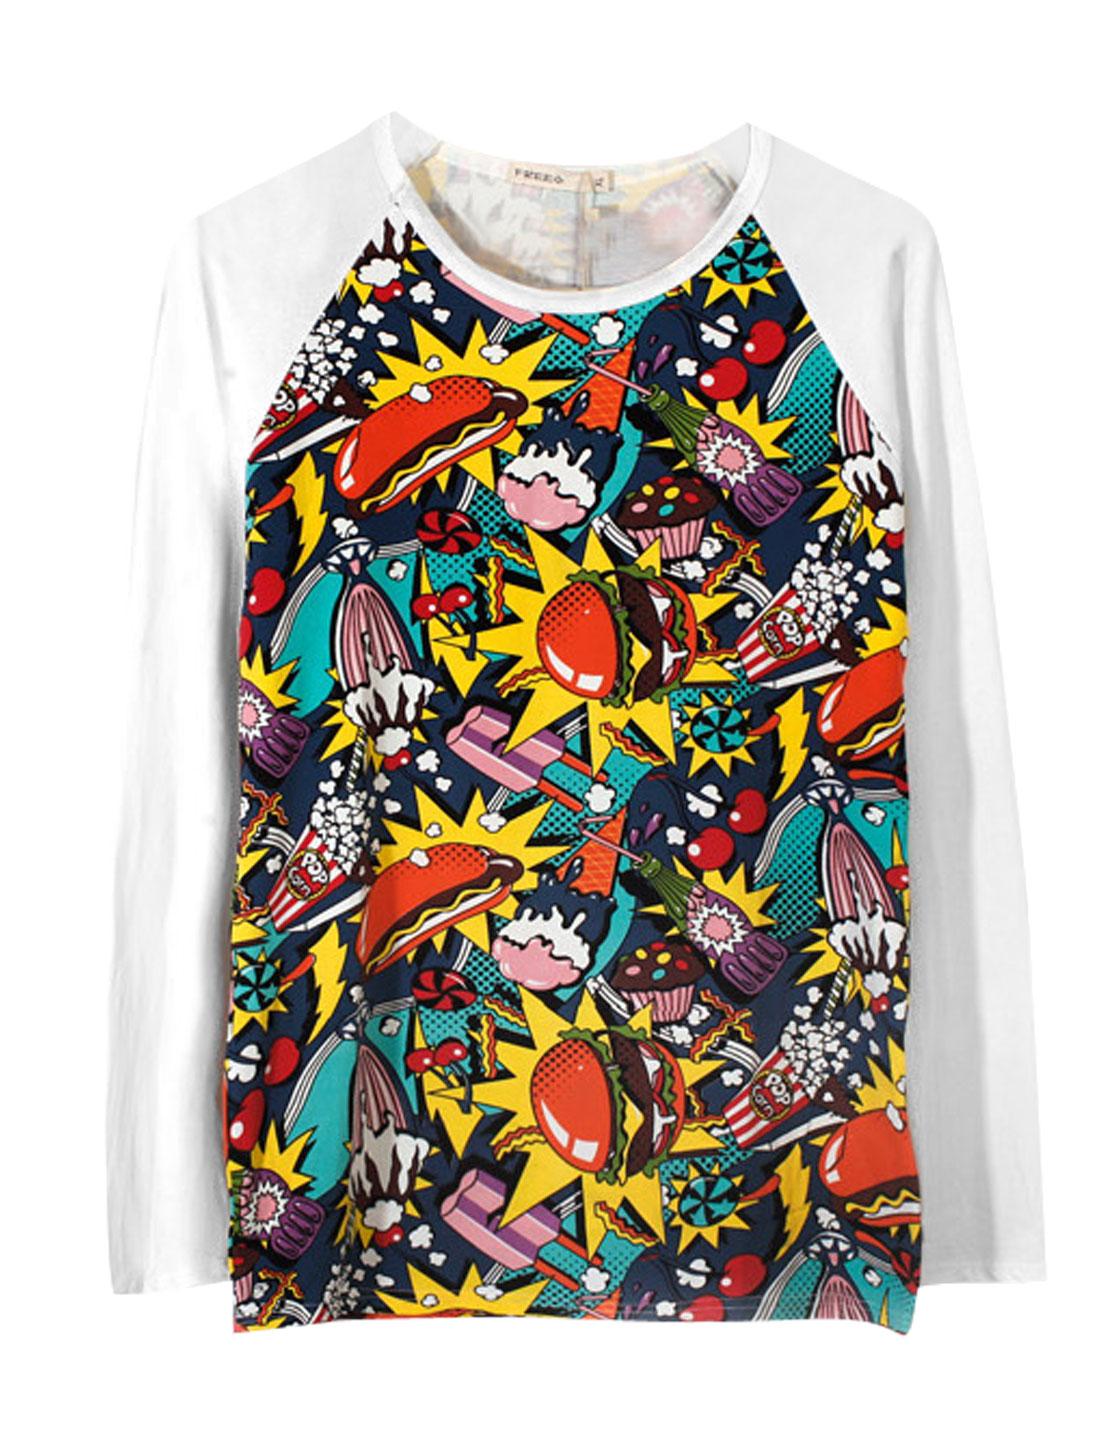 Men Multicolor Graffiti Prints Pullover Raglan Sleeves Round Neck T-Shirt M